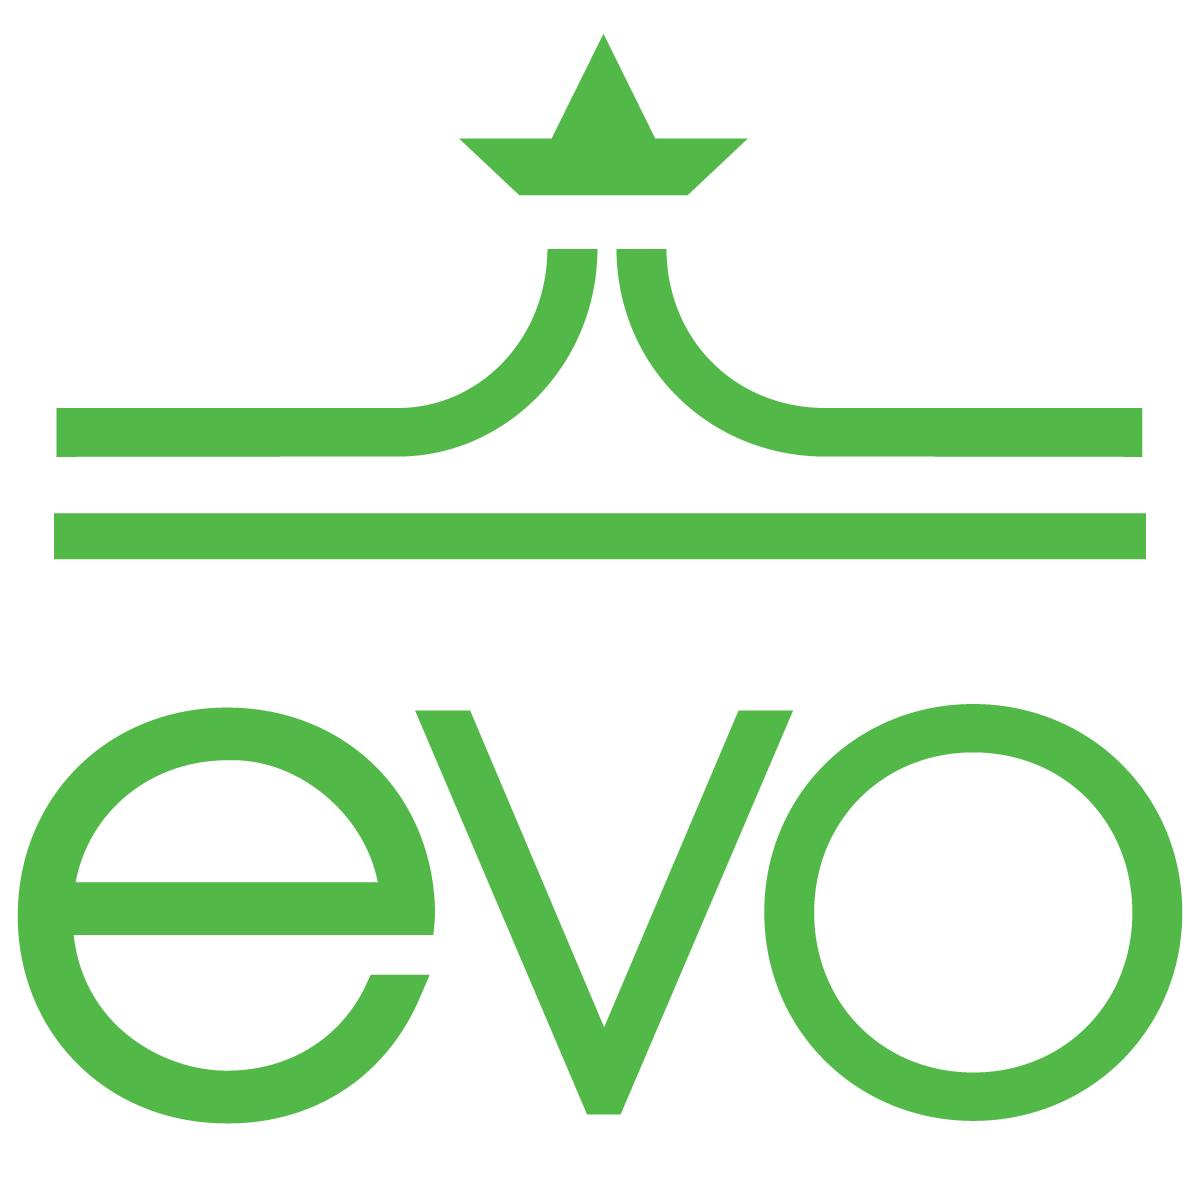 evo_logo_cmyk.png